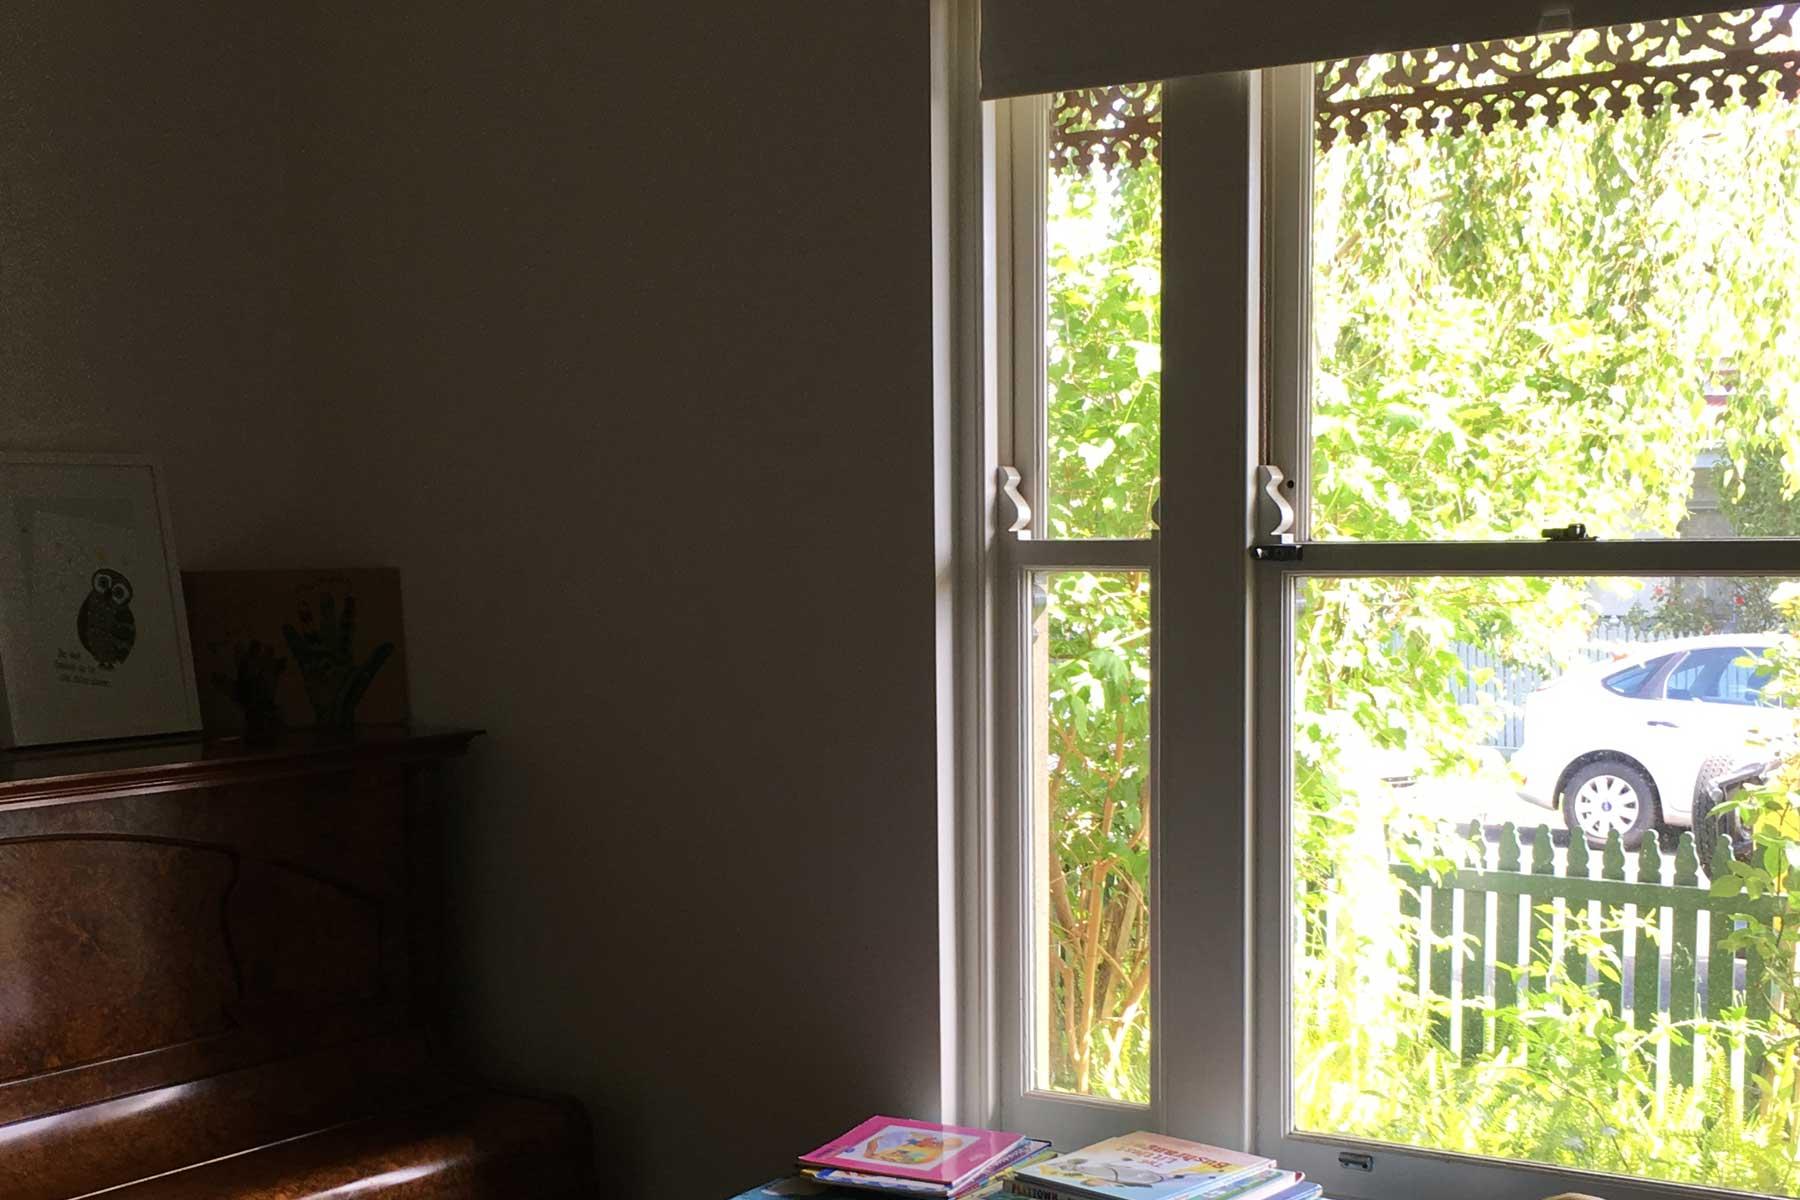 Lauras scandi home office - before - window piano